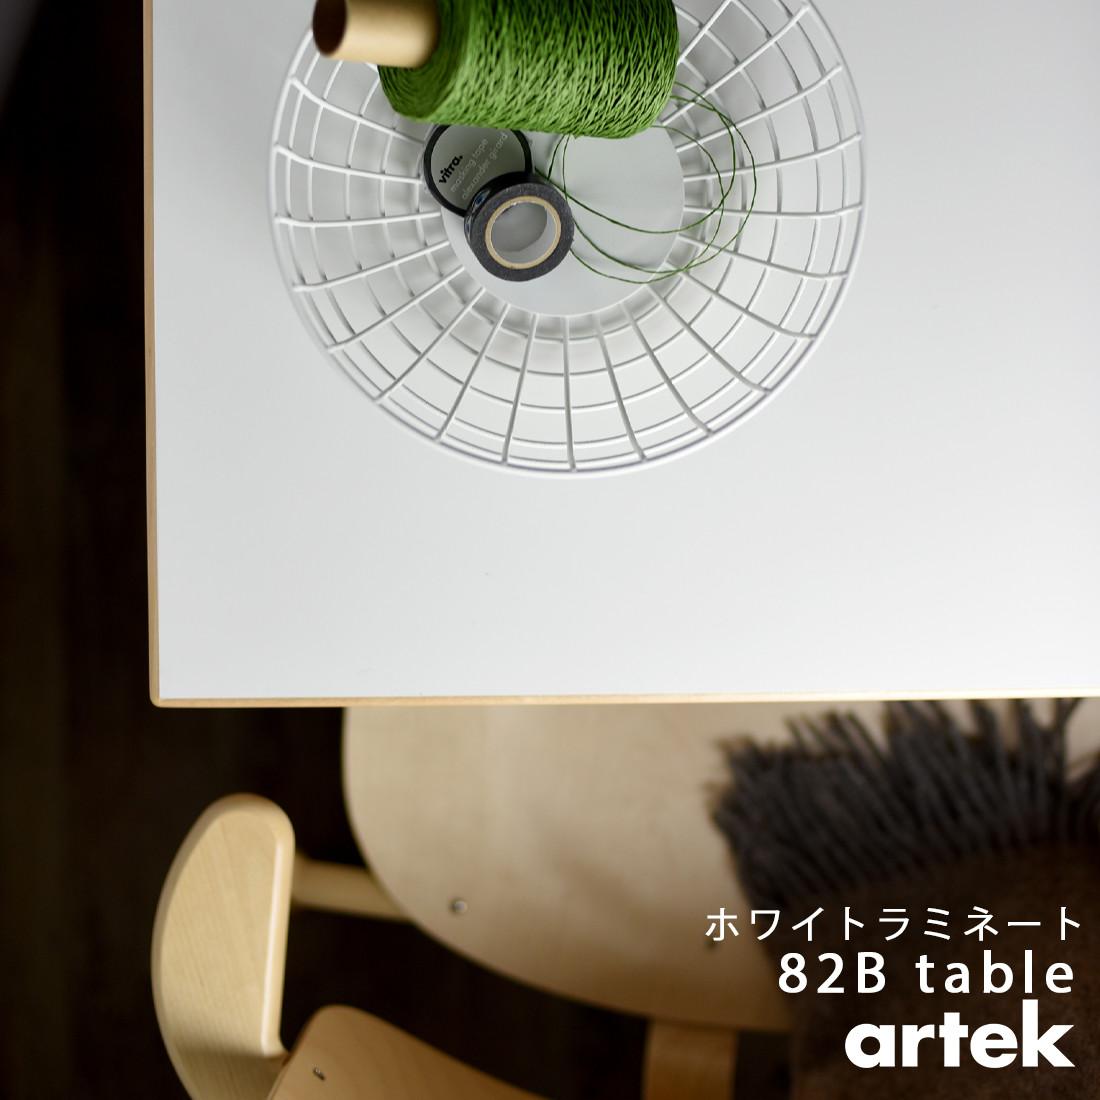 【artek/アルテック】TABLE 82B テーブル ホワイトラミネート 135x85x72cmダイニング/フィンランド/曲げ木